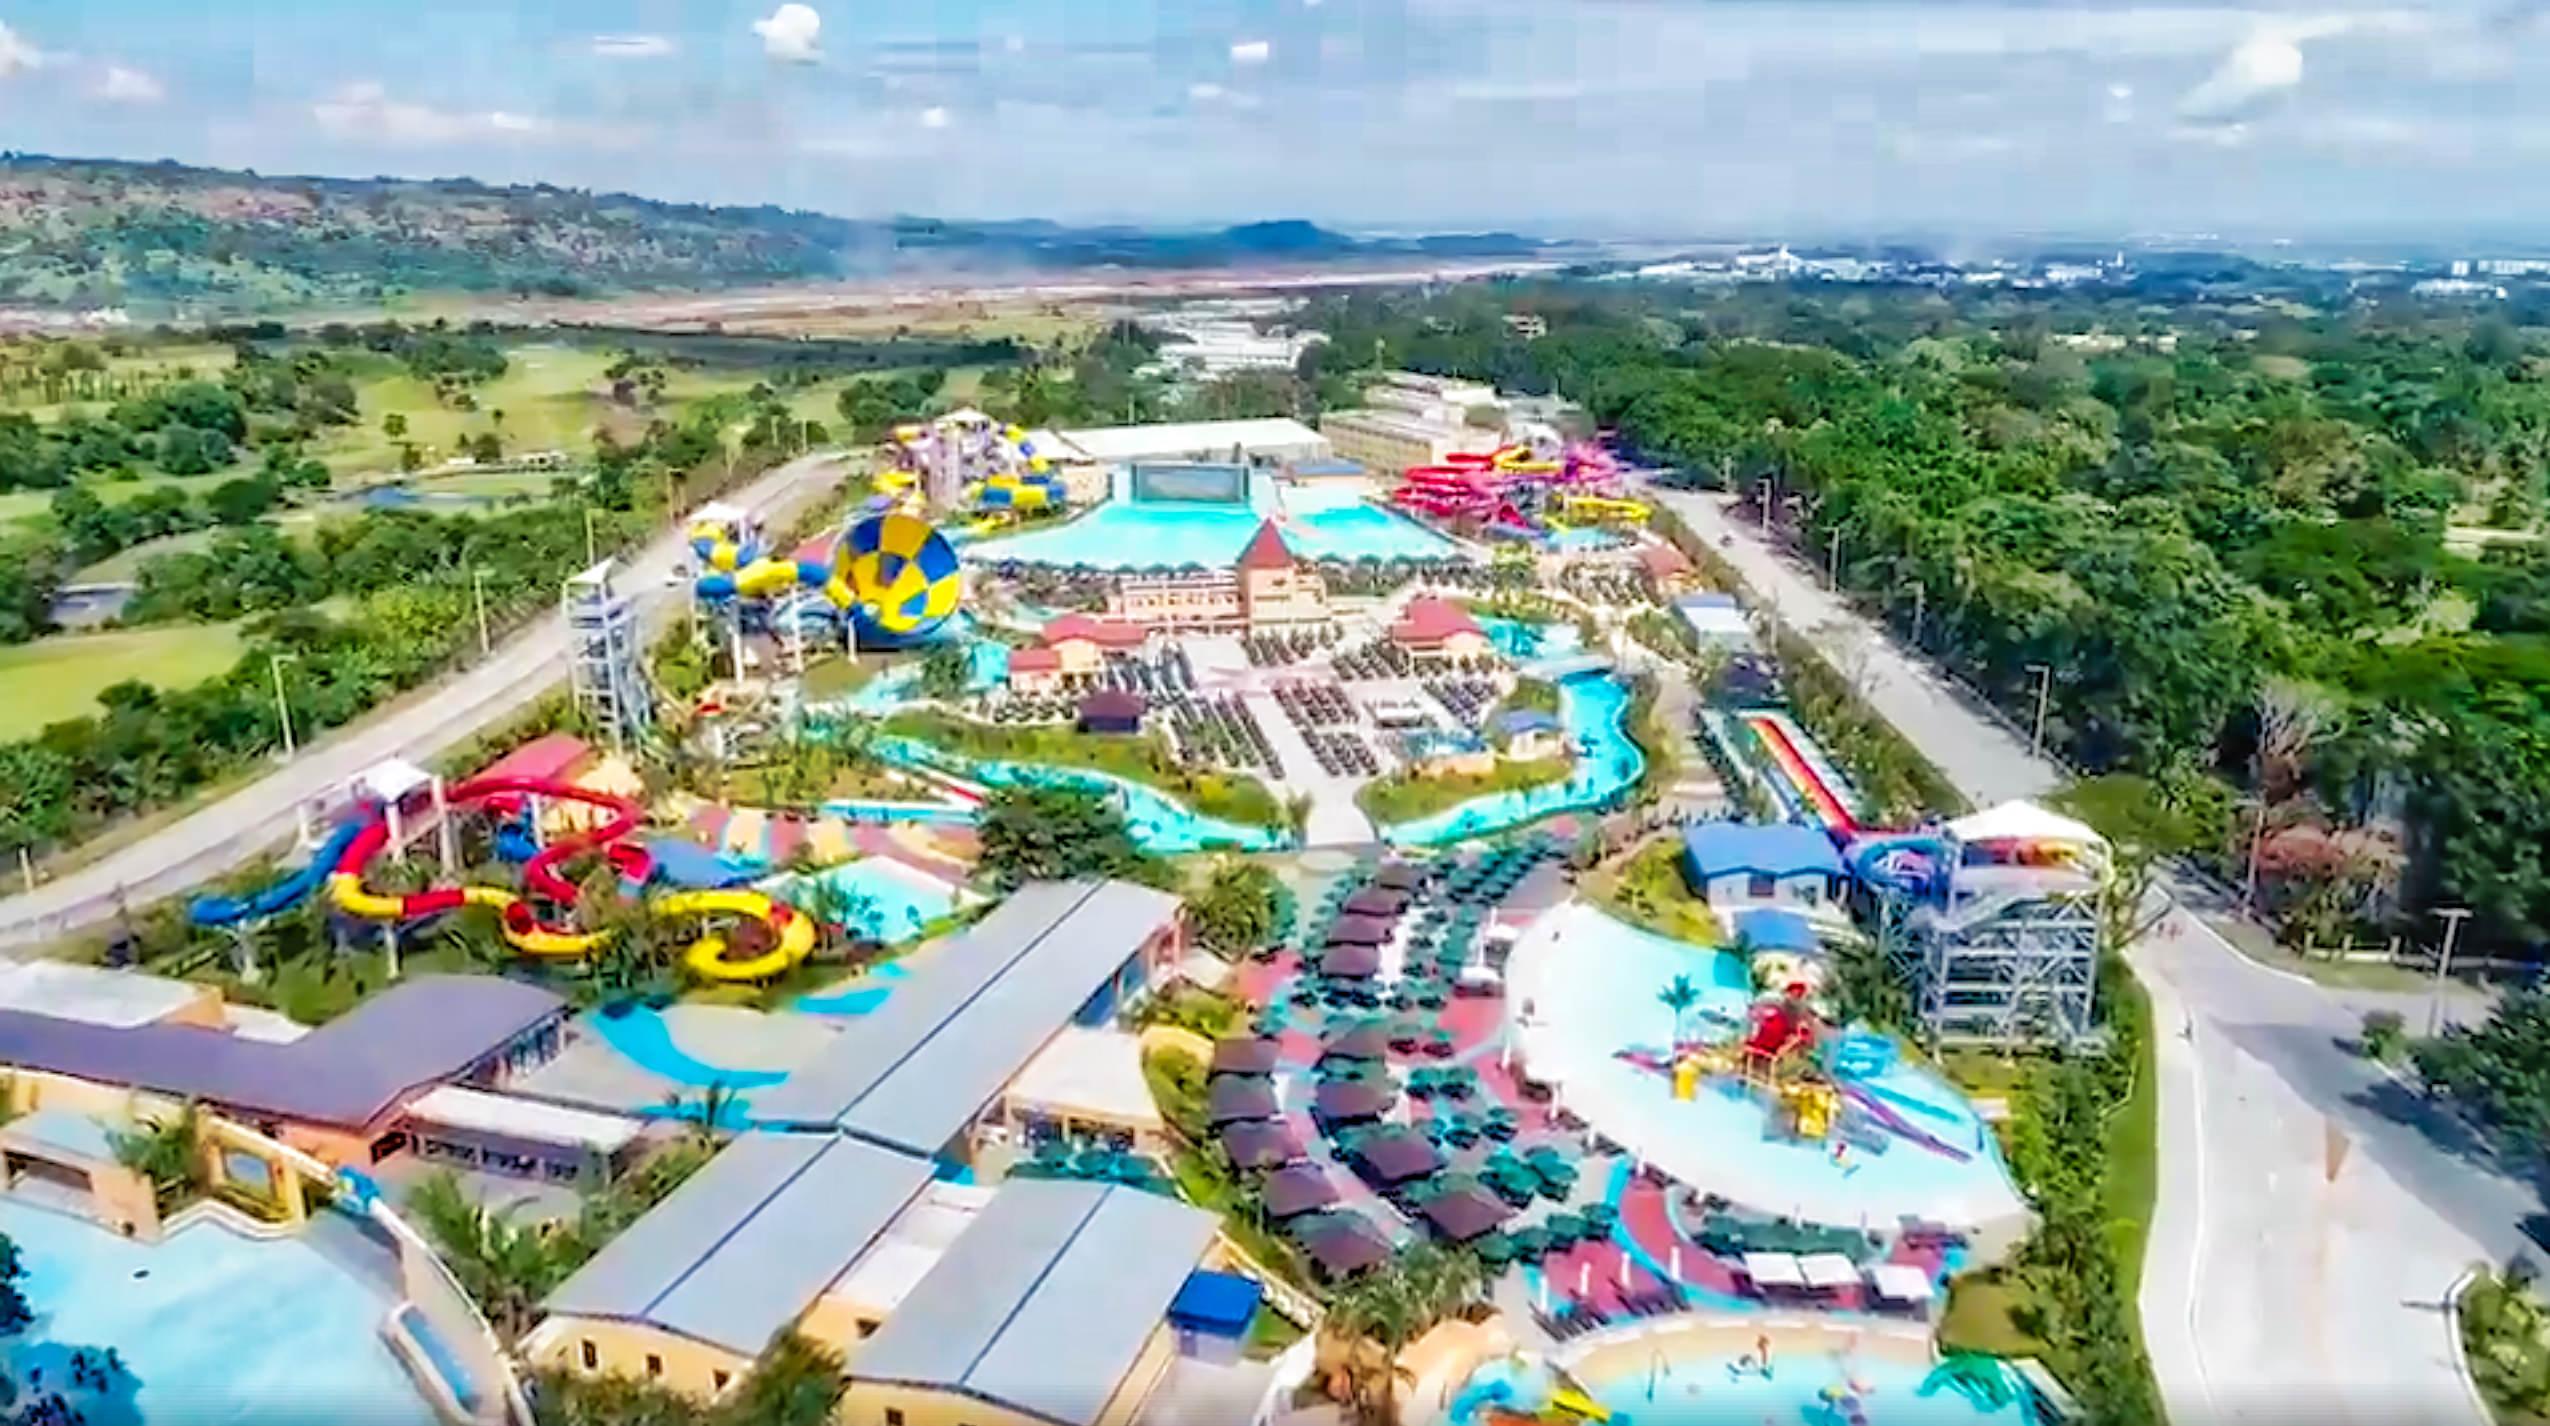 Freeport Video Aqua Planet Waterpark Pampanga Opening On February 24